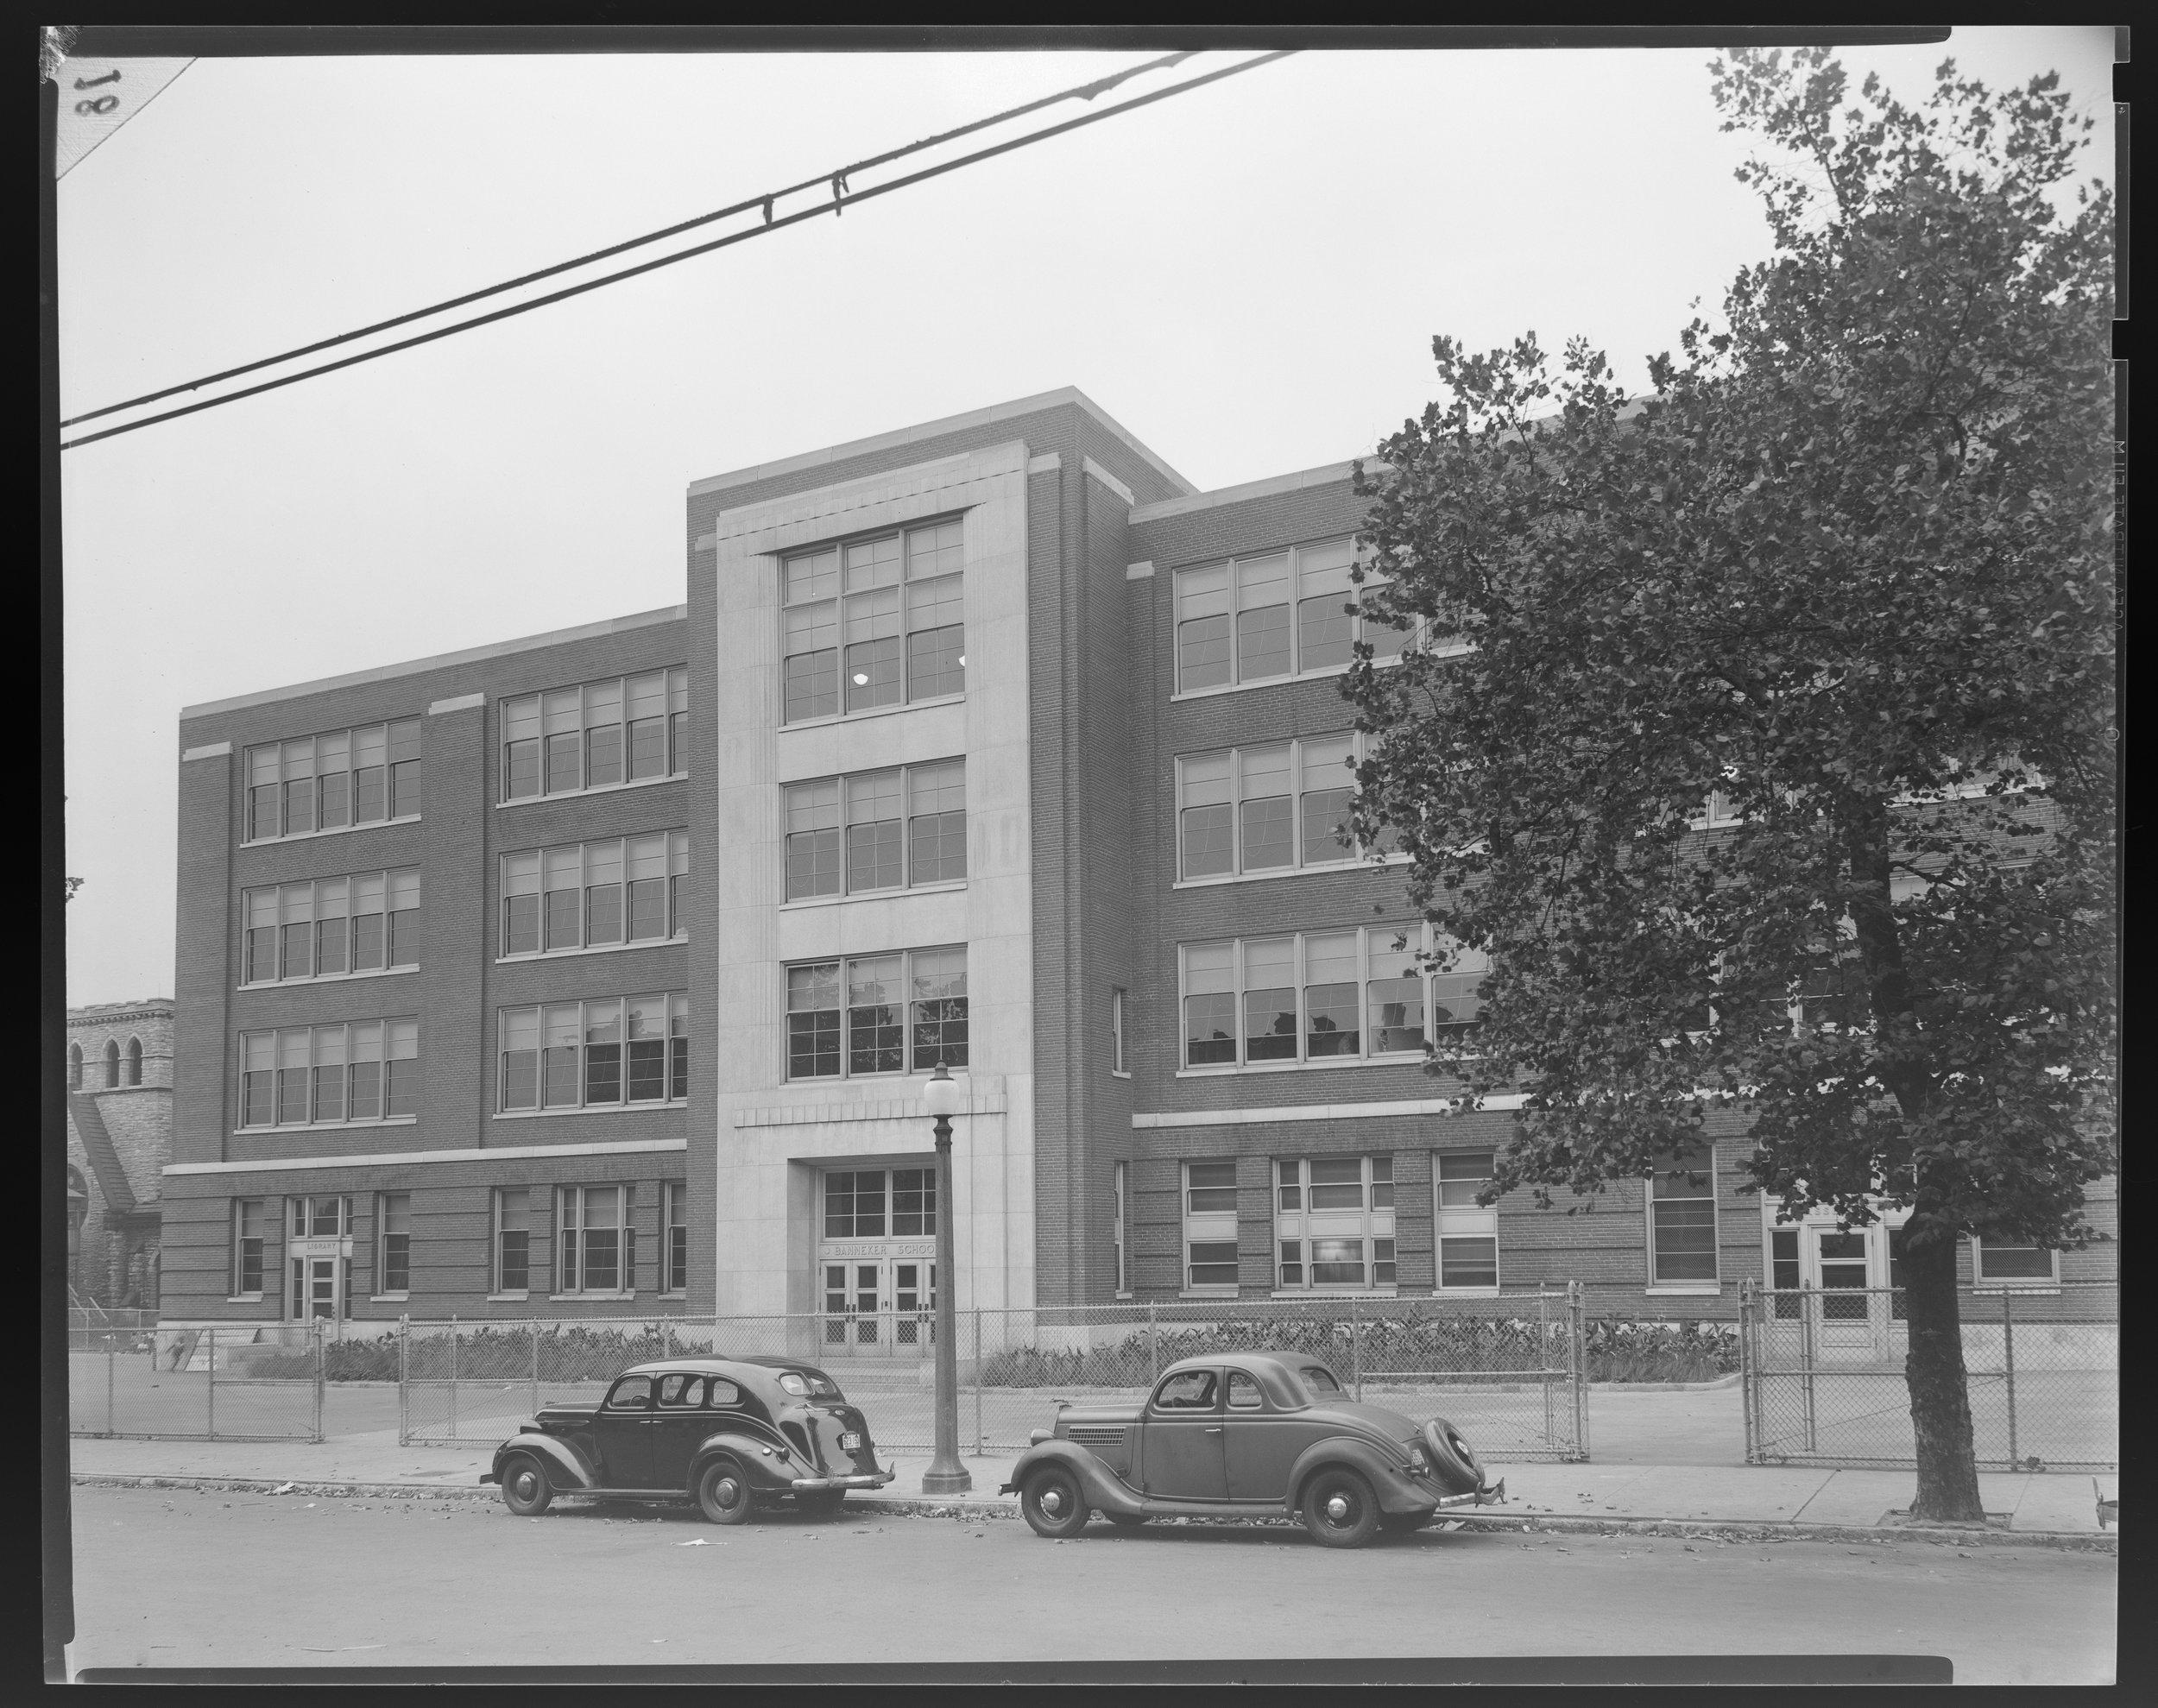 Bannaker School Photo Source -  Missouri Historical Society  (ca. 1940)